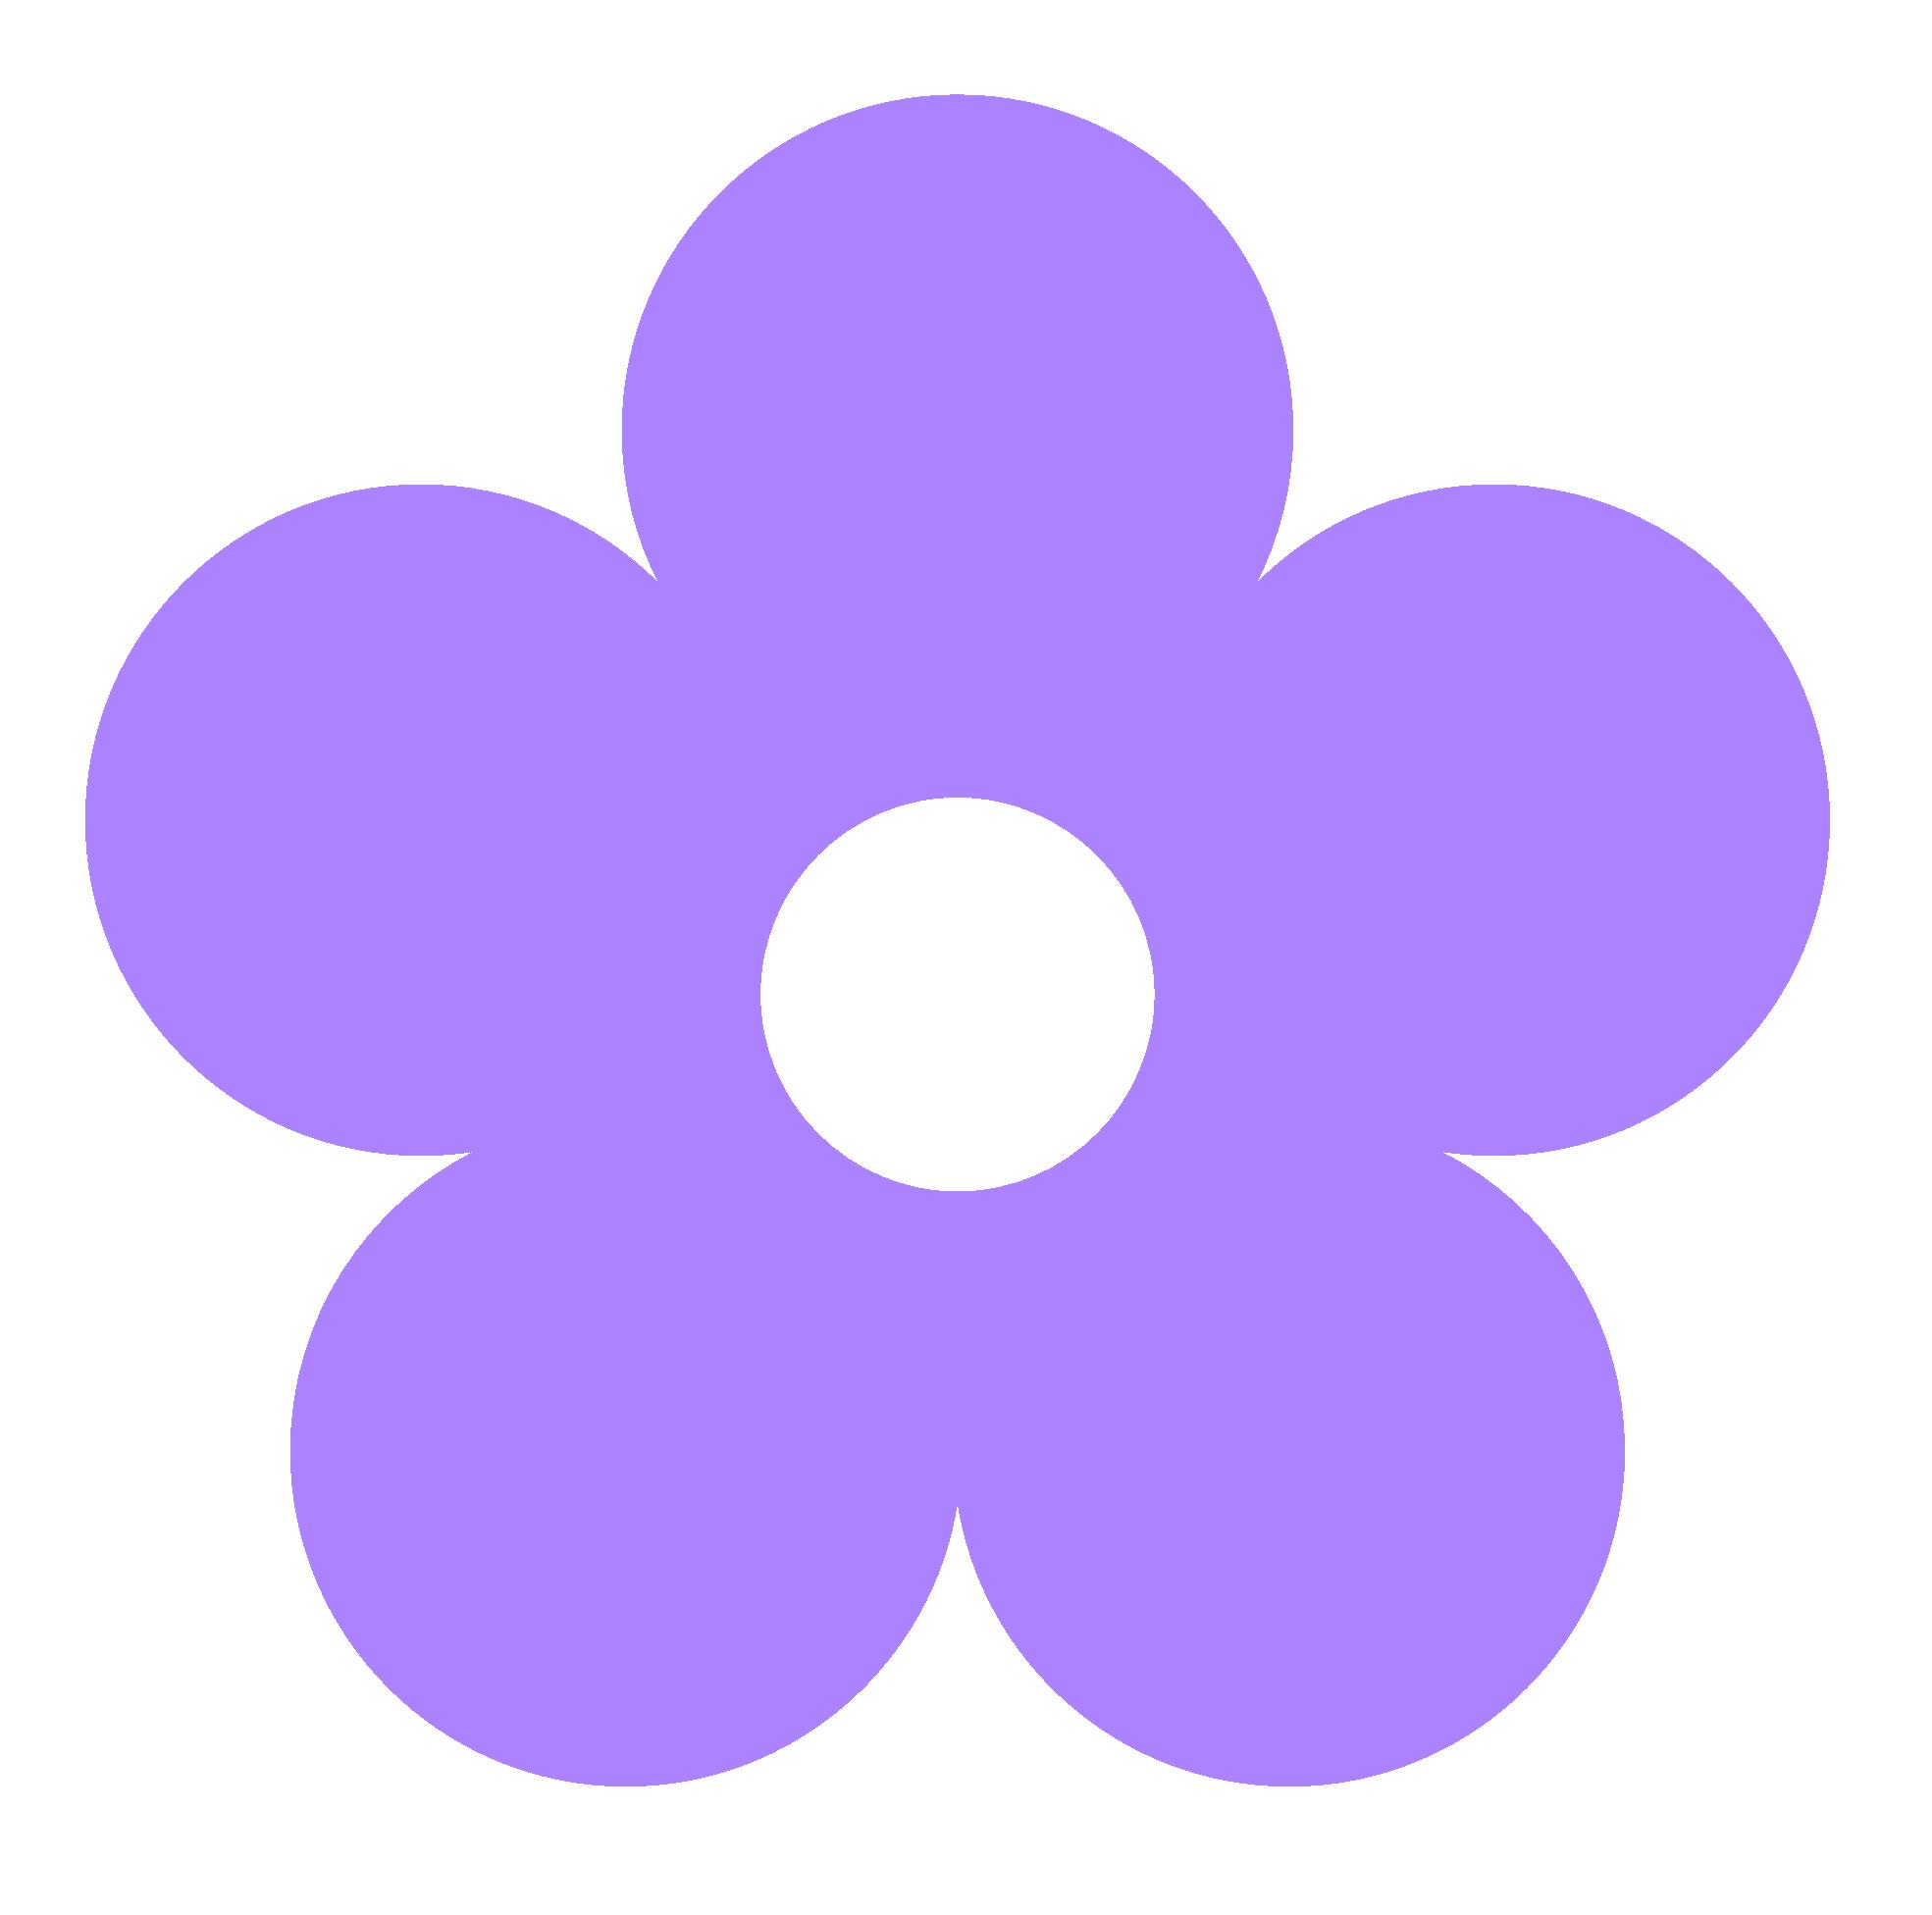 Purple flowers clip art border cliparts co - Clip Art Pink And Purple Tulips